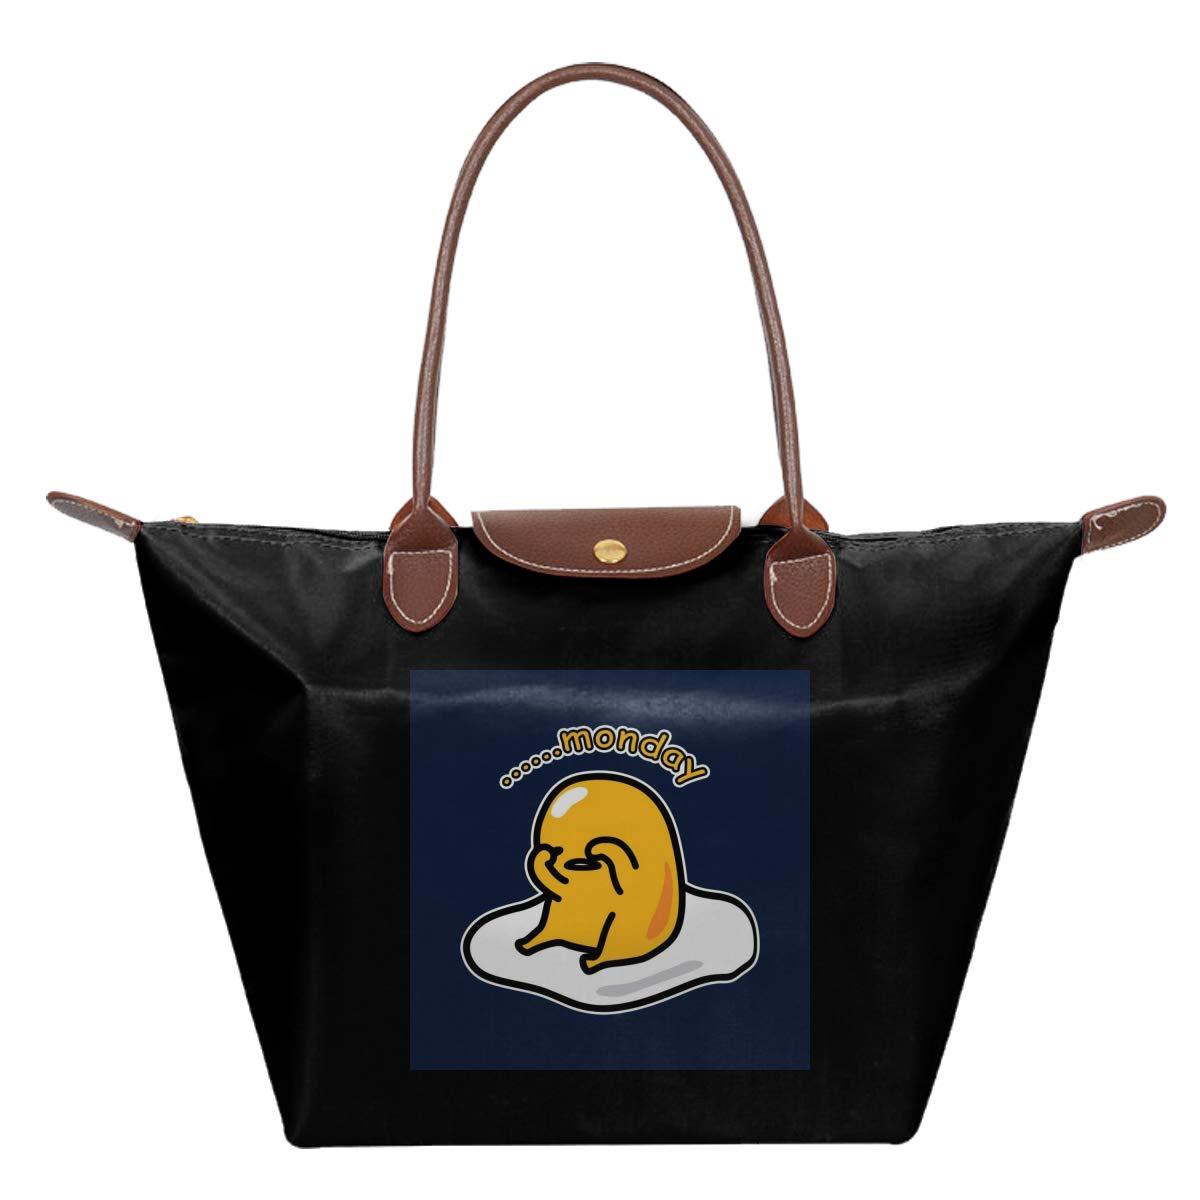 Gudetama Hates Monday Waterproof Leather Folded Messenger Nylon Bag Travel Tote Hopping Folding School Handbags